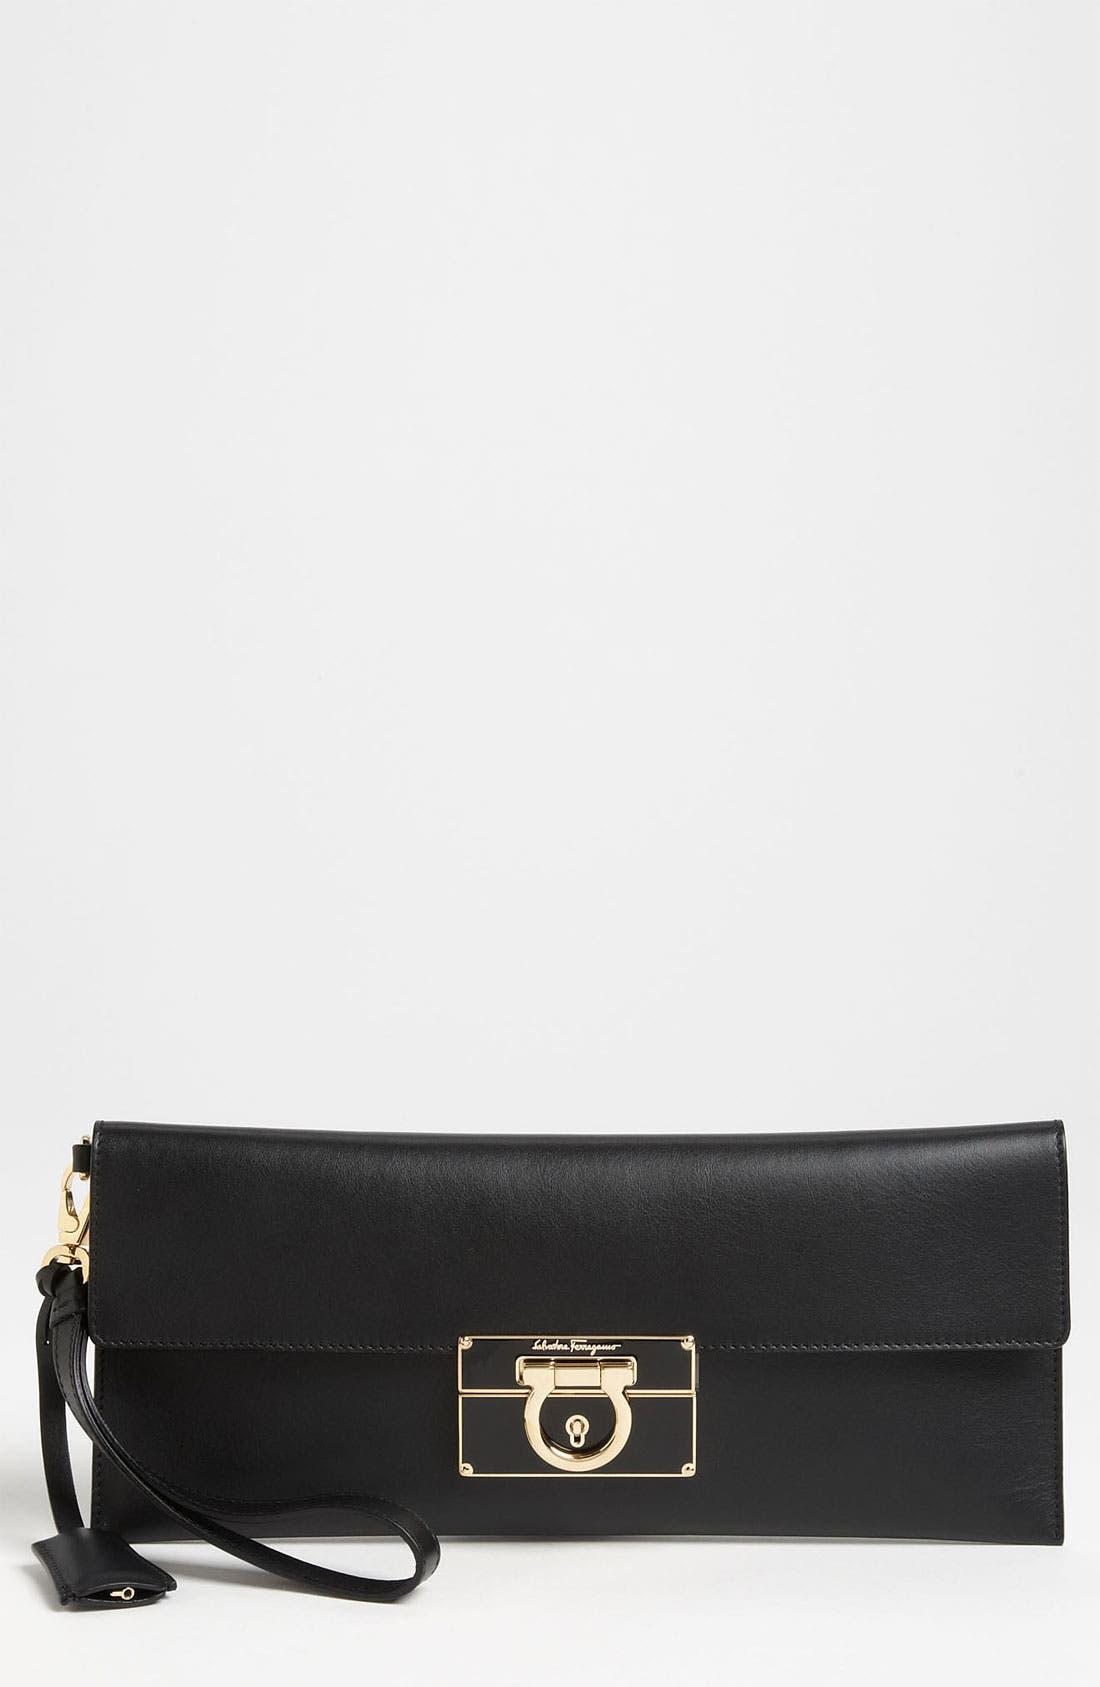 Main Image - Salvatore Ferragamo 'Afef' Leather Envelope Clutch